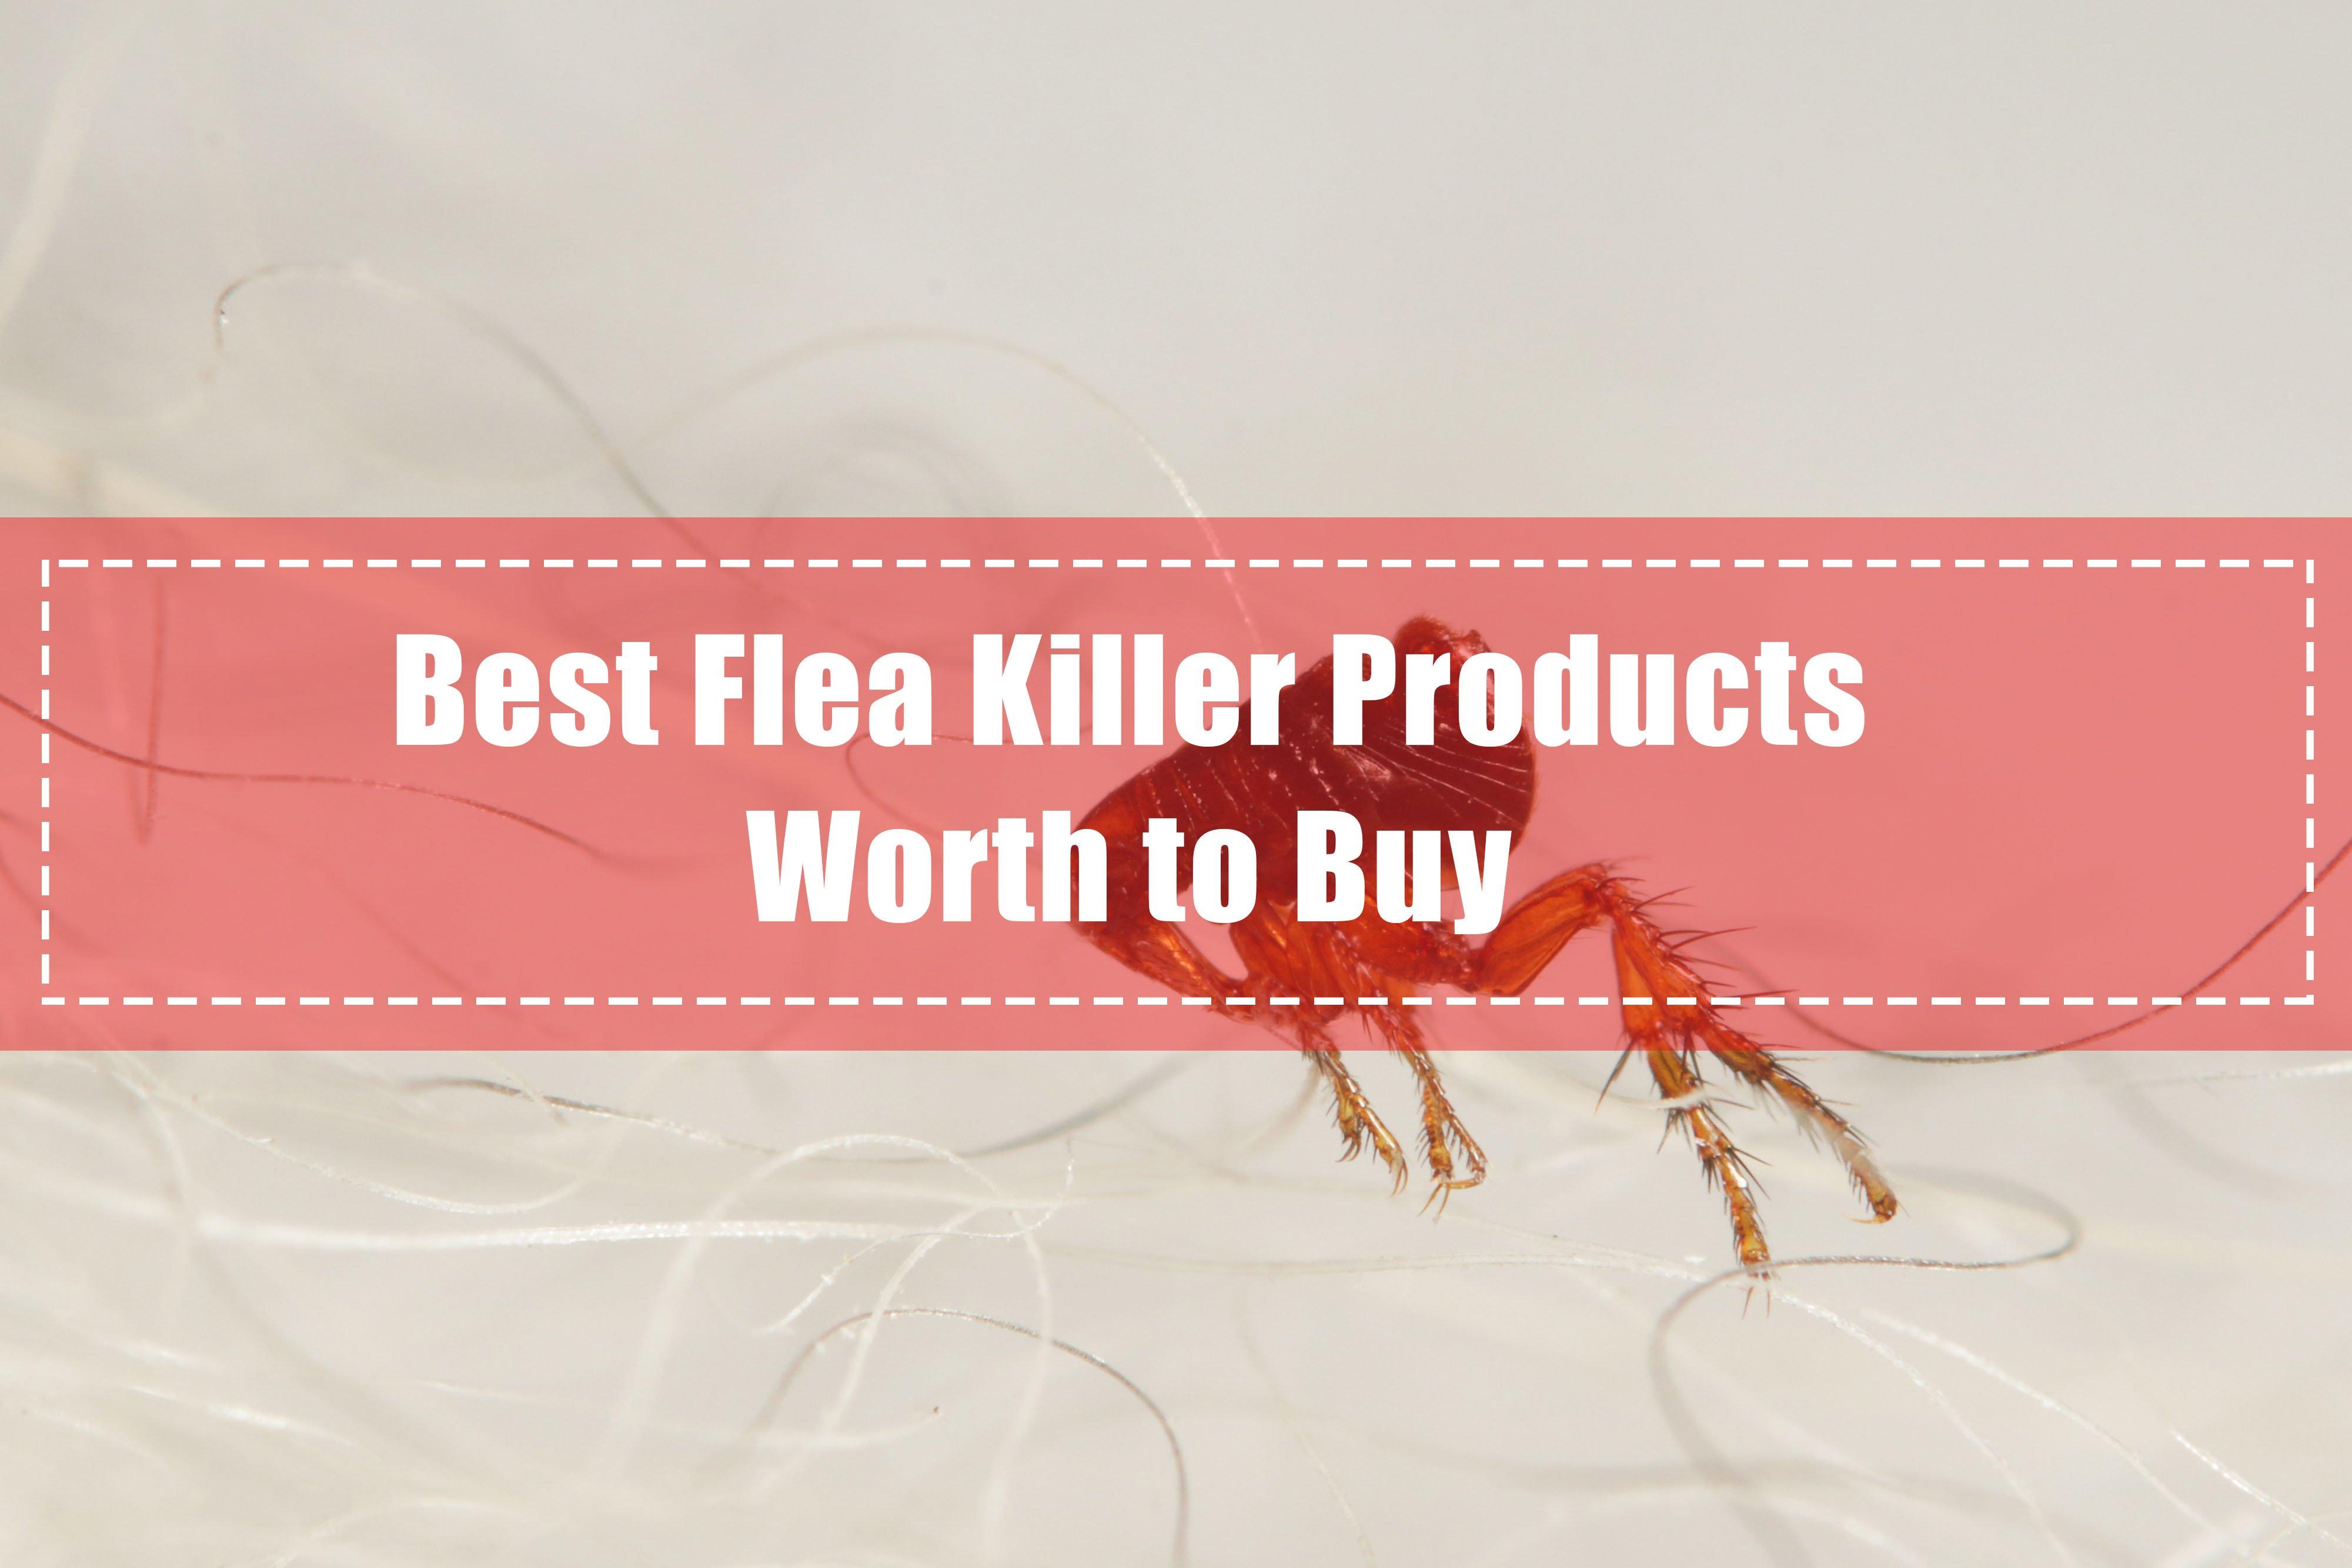 Best Flea Killer Products